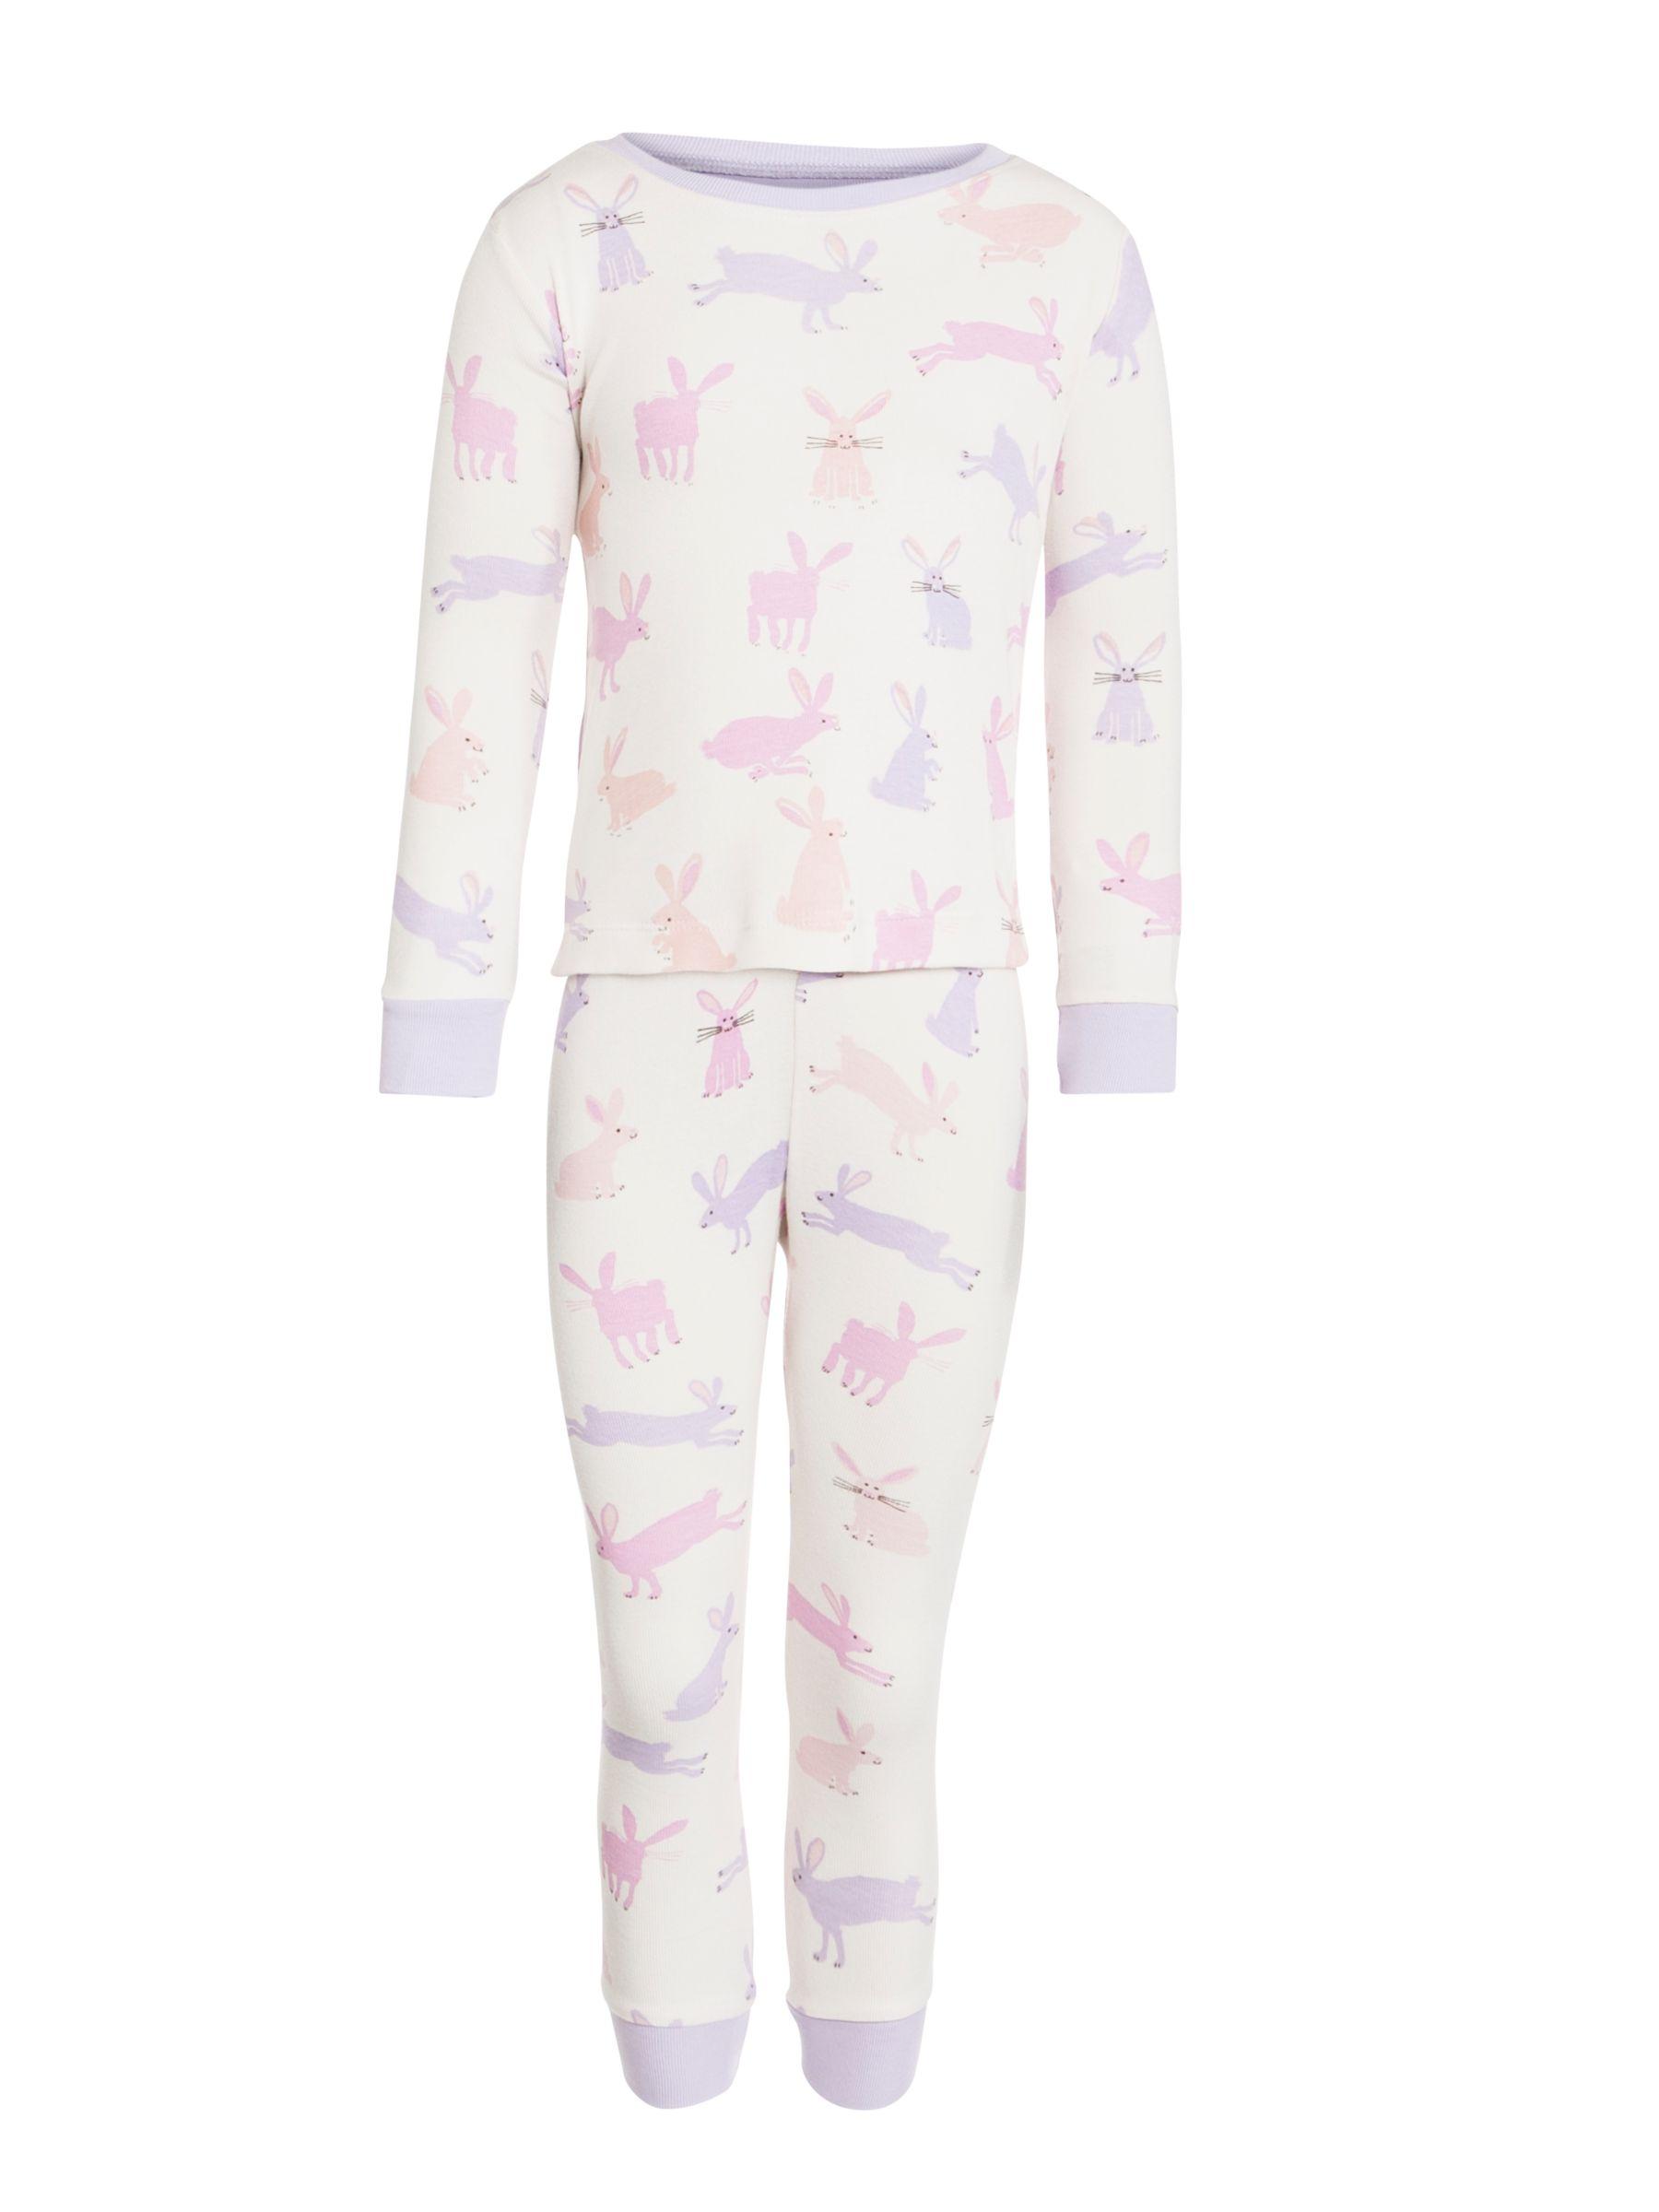 Hatley Soft Bunnies Girls' Pyjamas, White/Multi